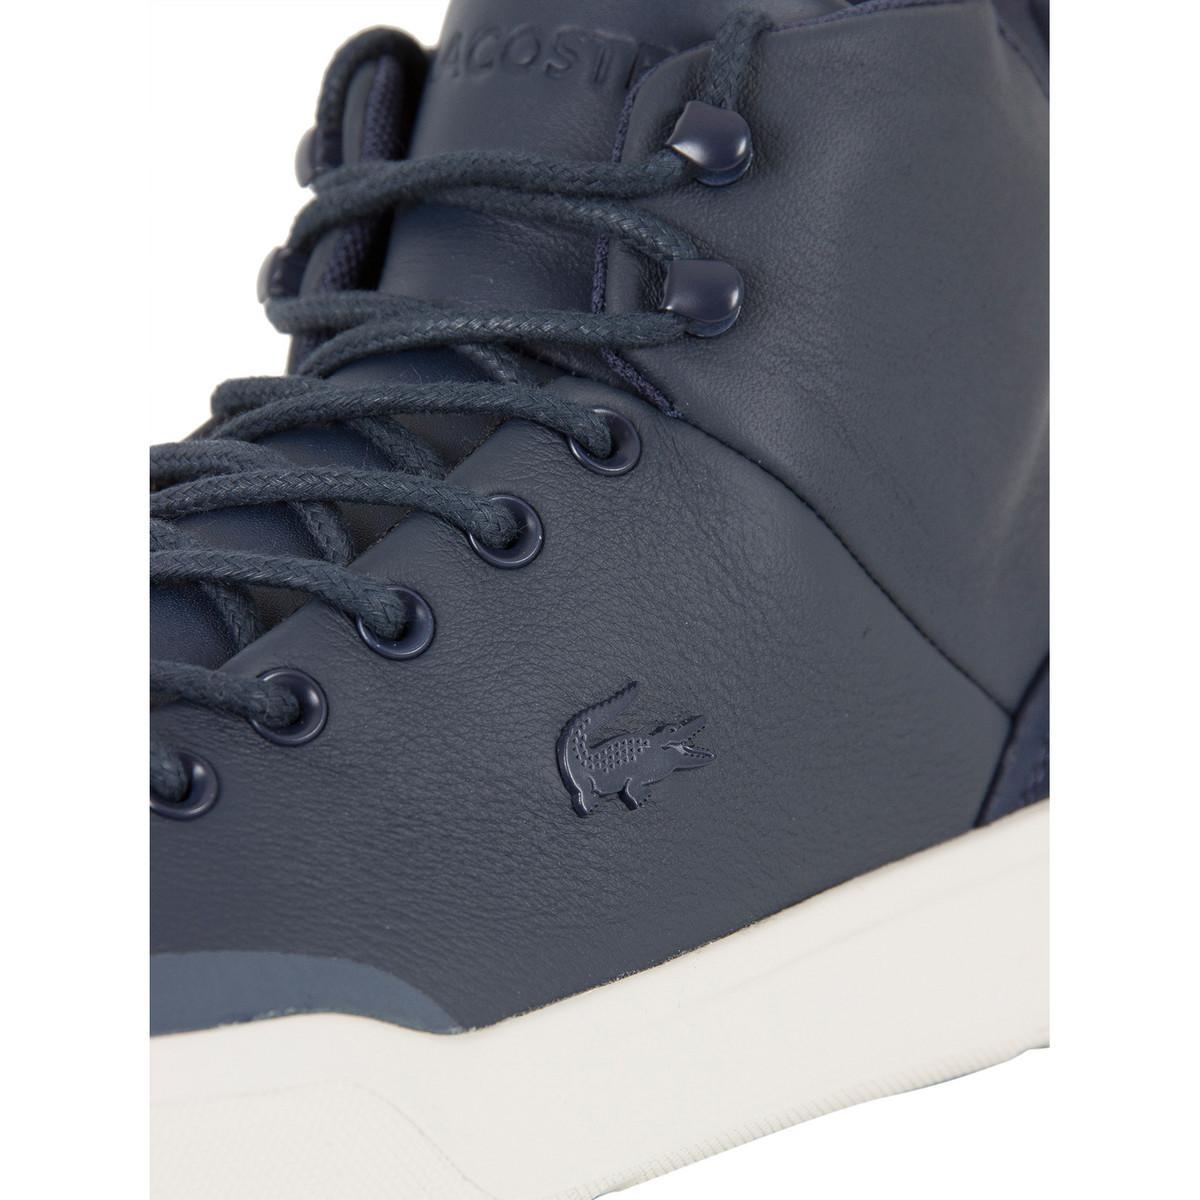 EXPLORATEUR CLASSIC 317 1 - Sneaker high - dark grey Freies Verschiffen Am Besten 100% Authentisch Billig Original Auslass Footlocker Bilder 7OTU63ZY